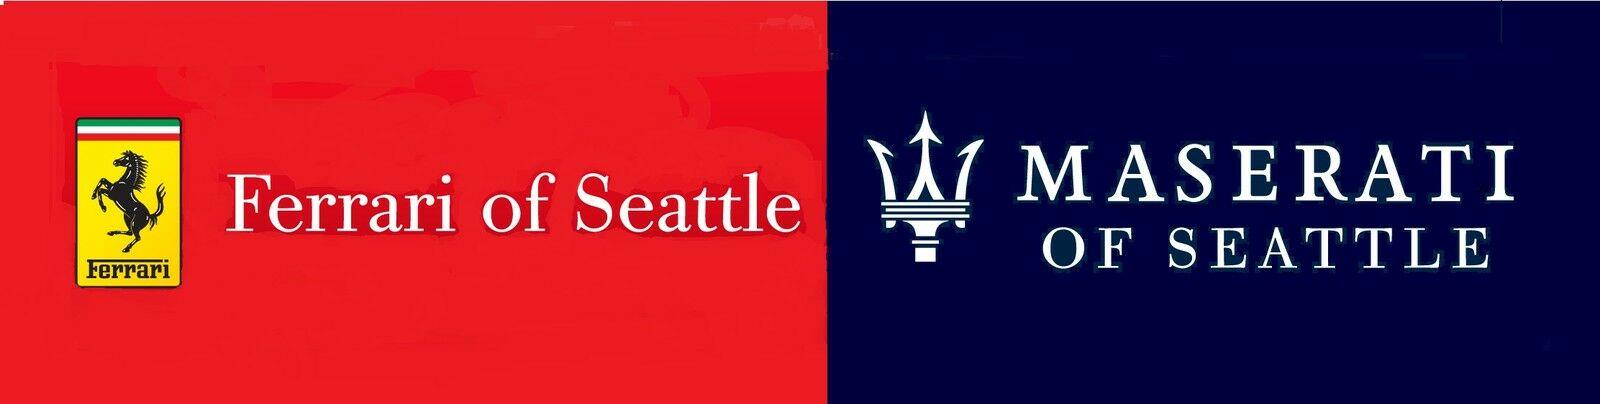 Ferrari & Maserati of Seattle